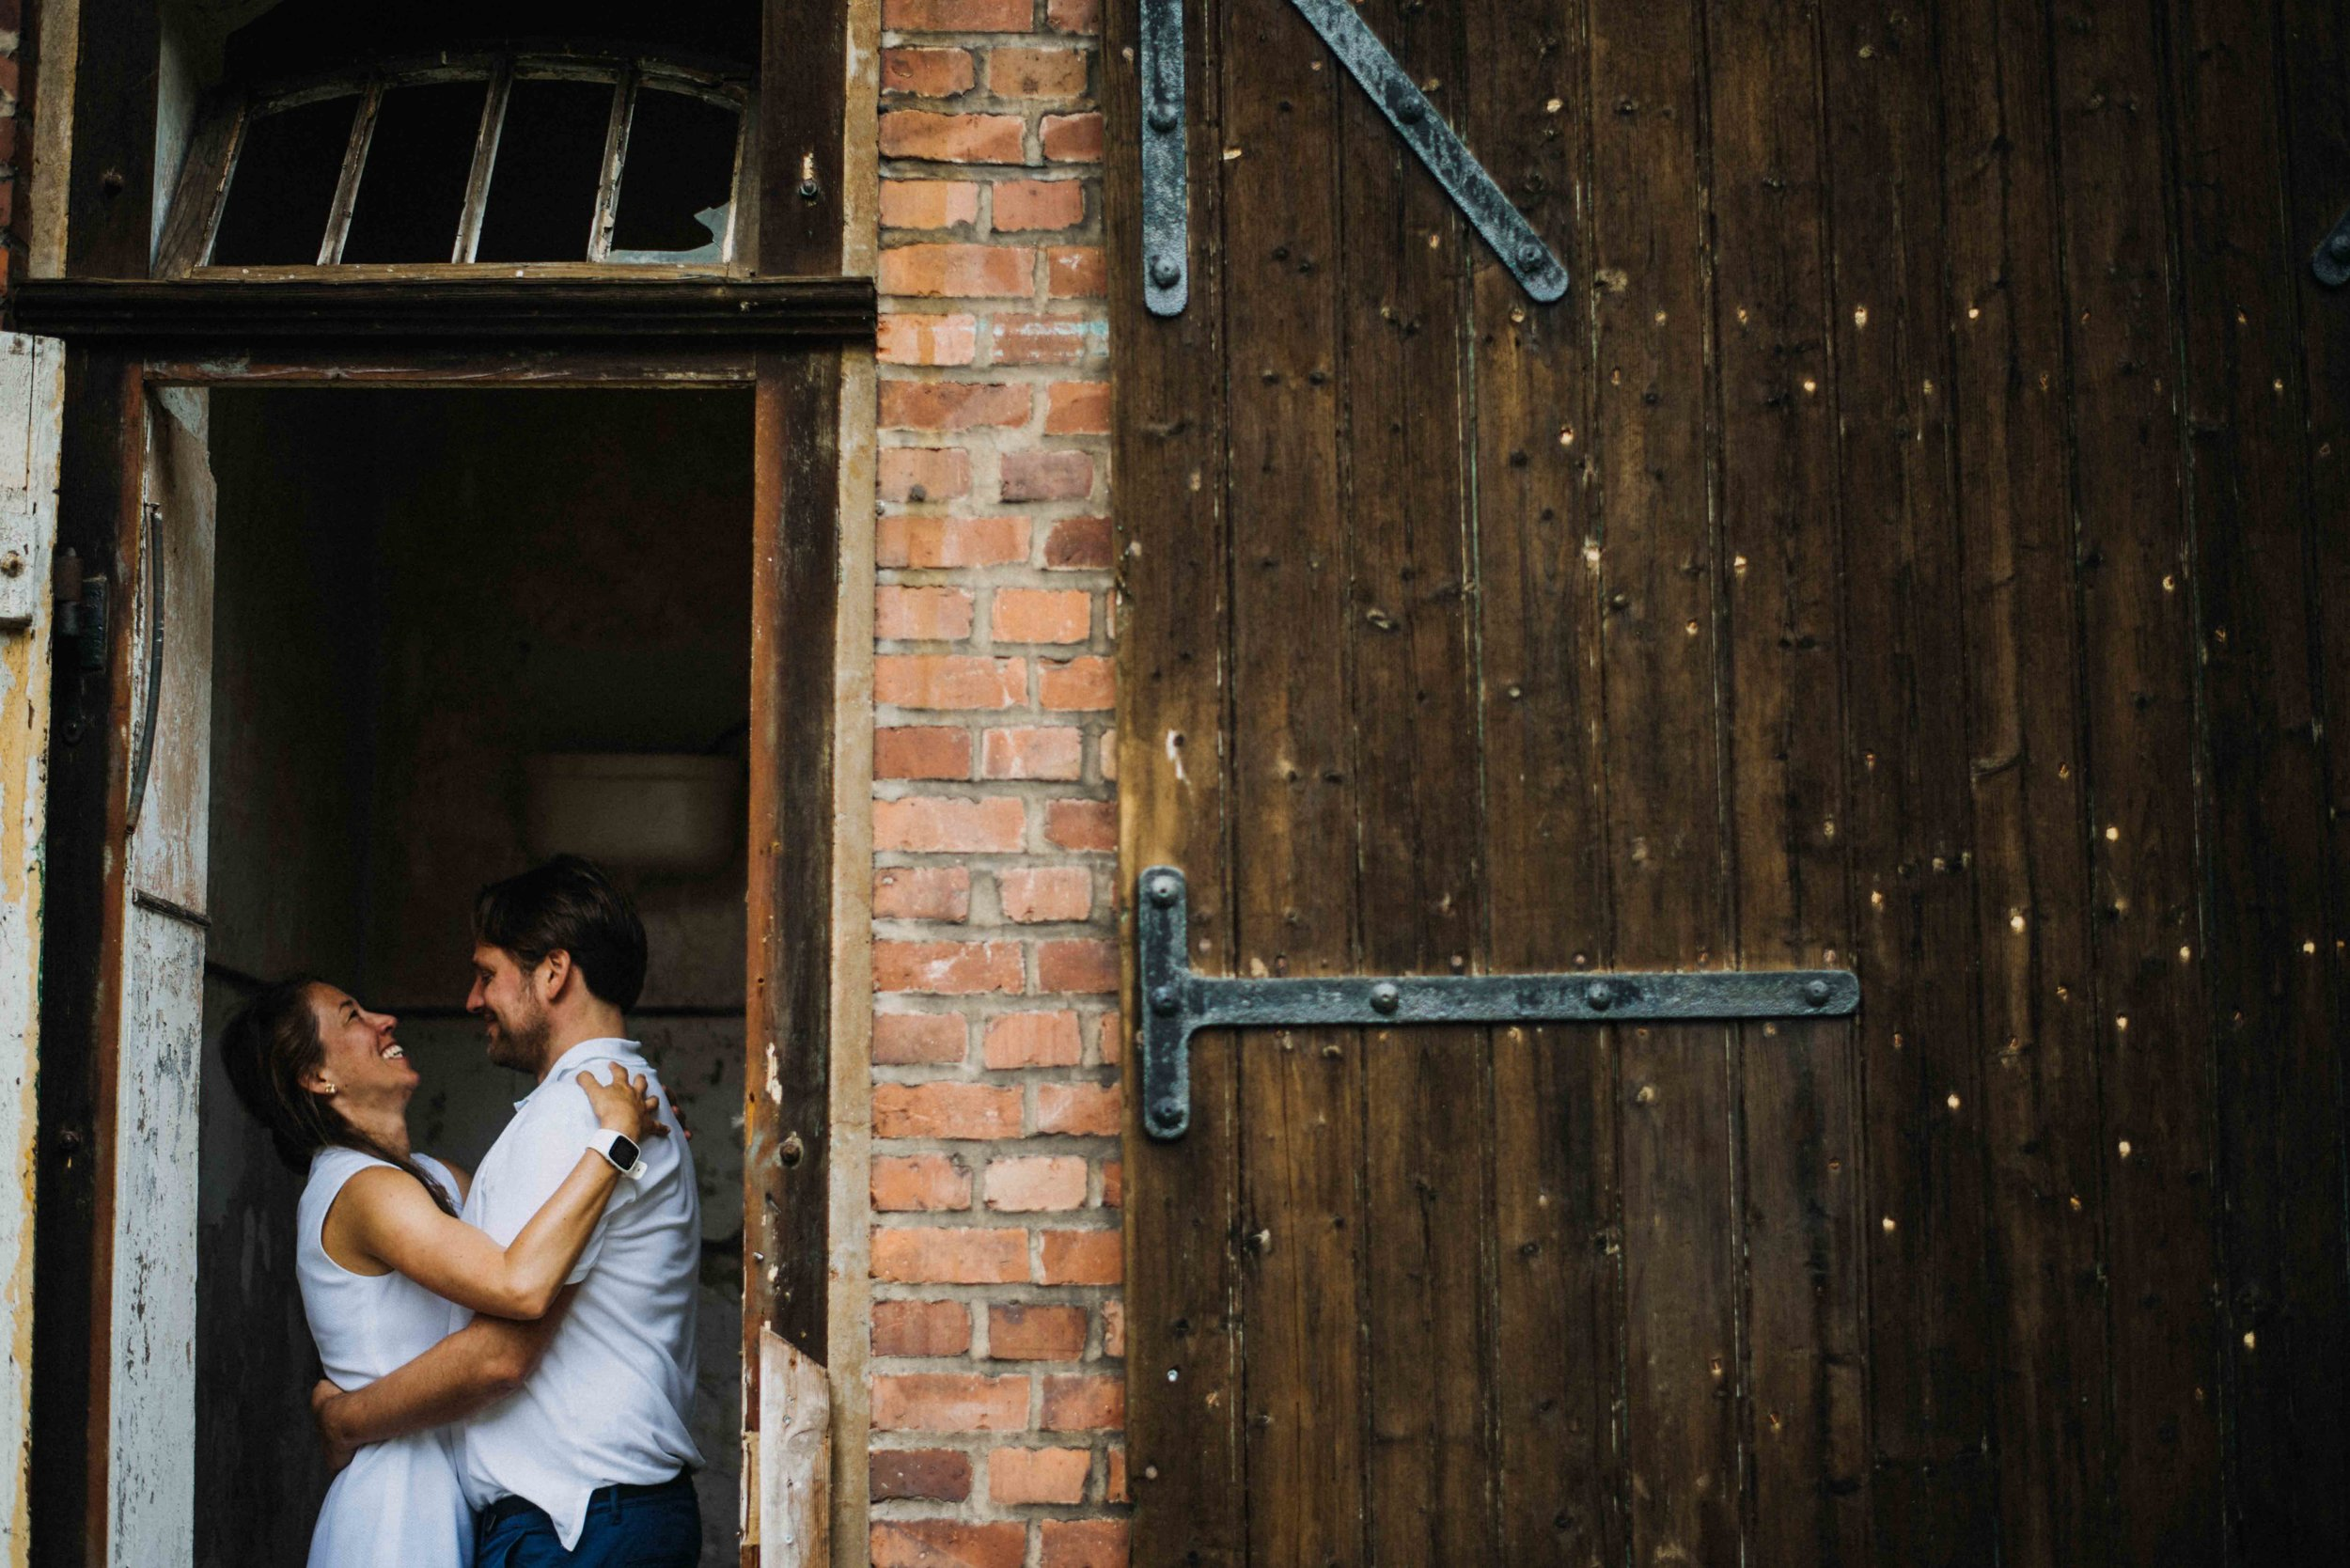 cologne_drachenfels_dusseldorf_germany_wedding_photography_engagement_hochzeit-0580.JPG